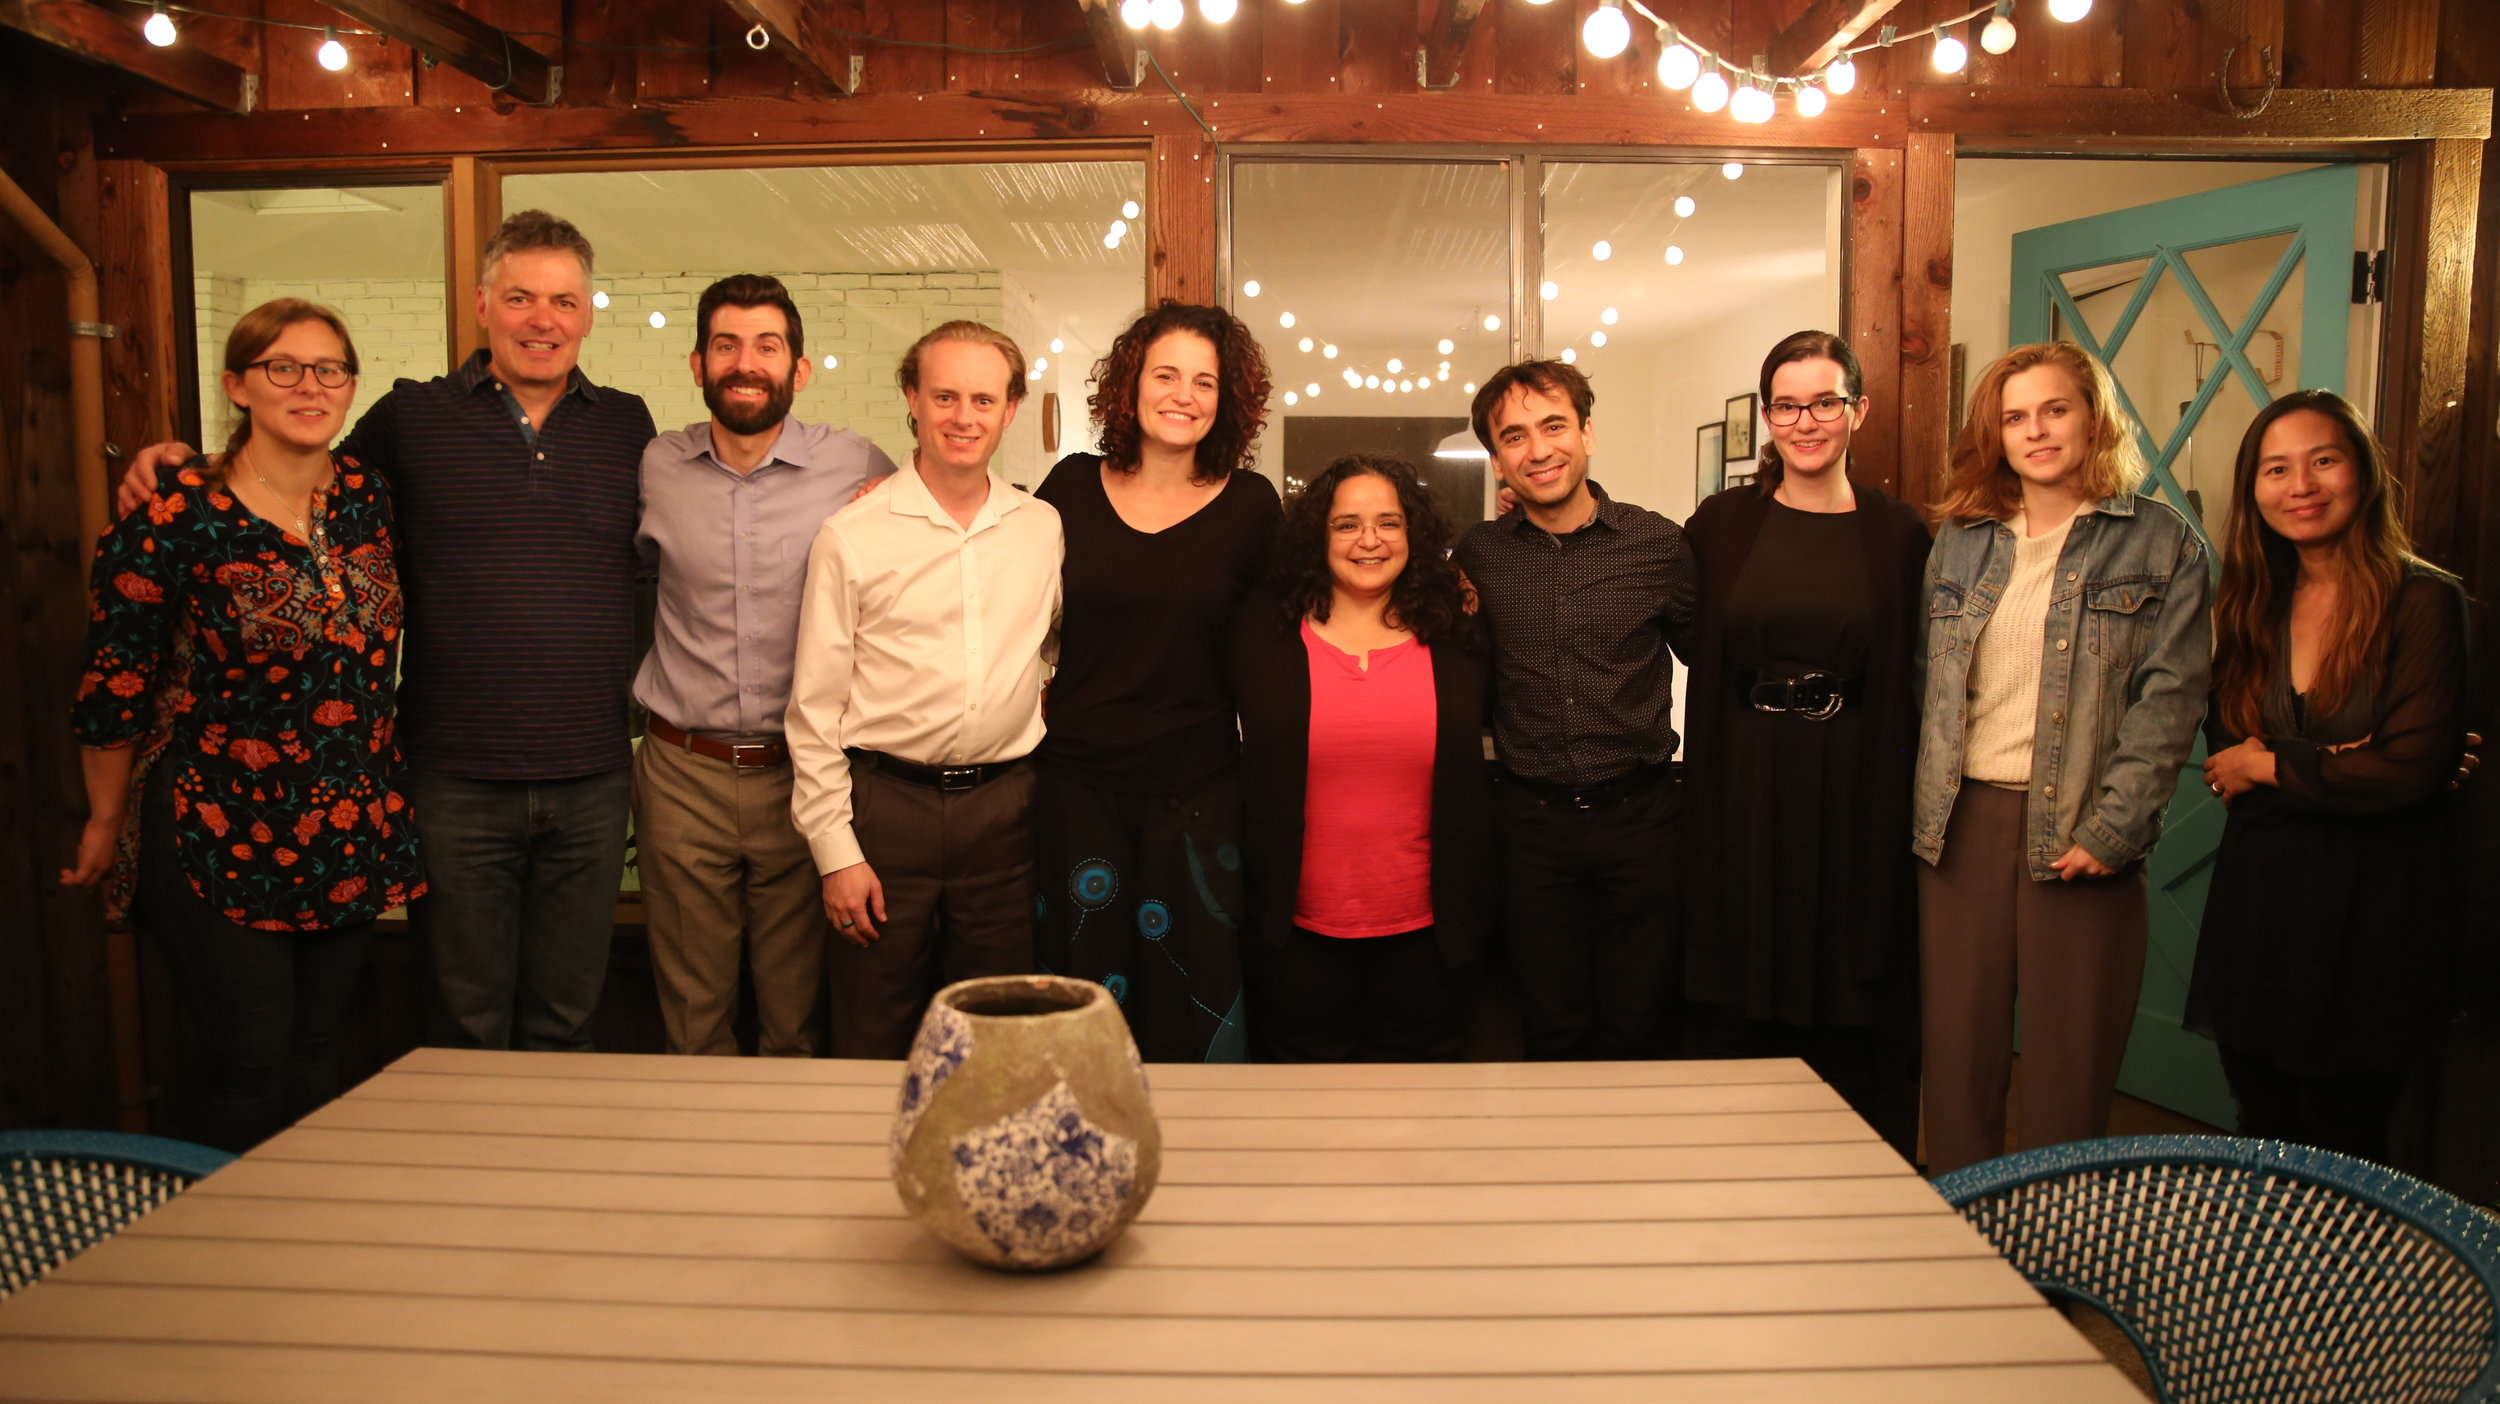 Left to right: Bonnie McLarty, Steve Juliani, Jonah Sirota, Greg Beaver, Becca Fischer, Gabriela Frank, Iman Habibi, Jessica Hunt, Beatrice Ferreira, Hyeyung Yung